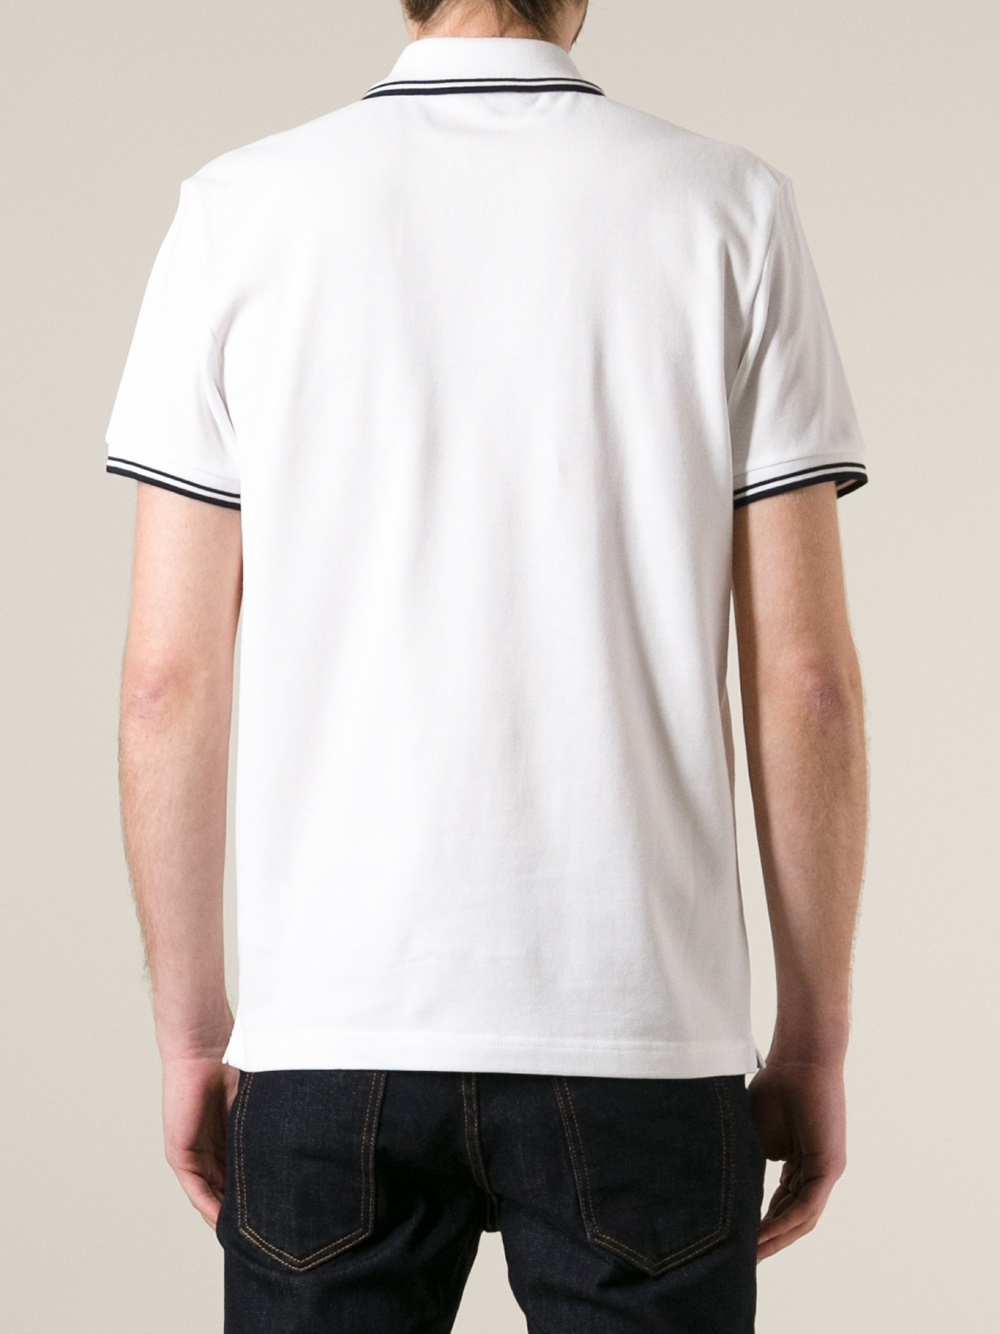 86115b2e1e47 Lyst - Moncler Striped Trim Polo Shirt in White for Men